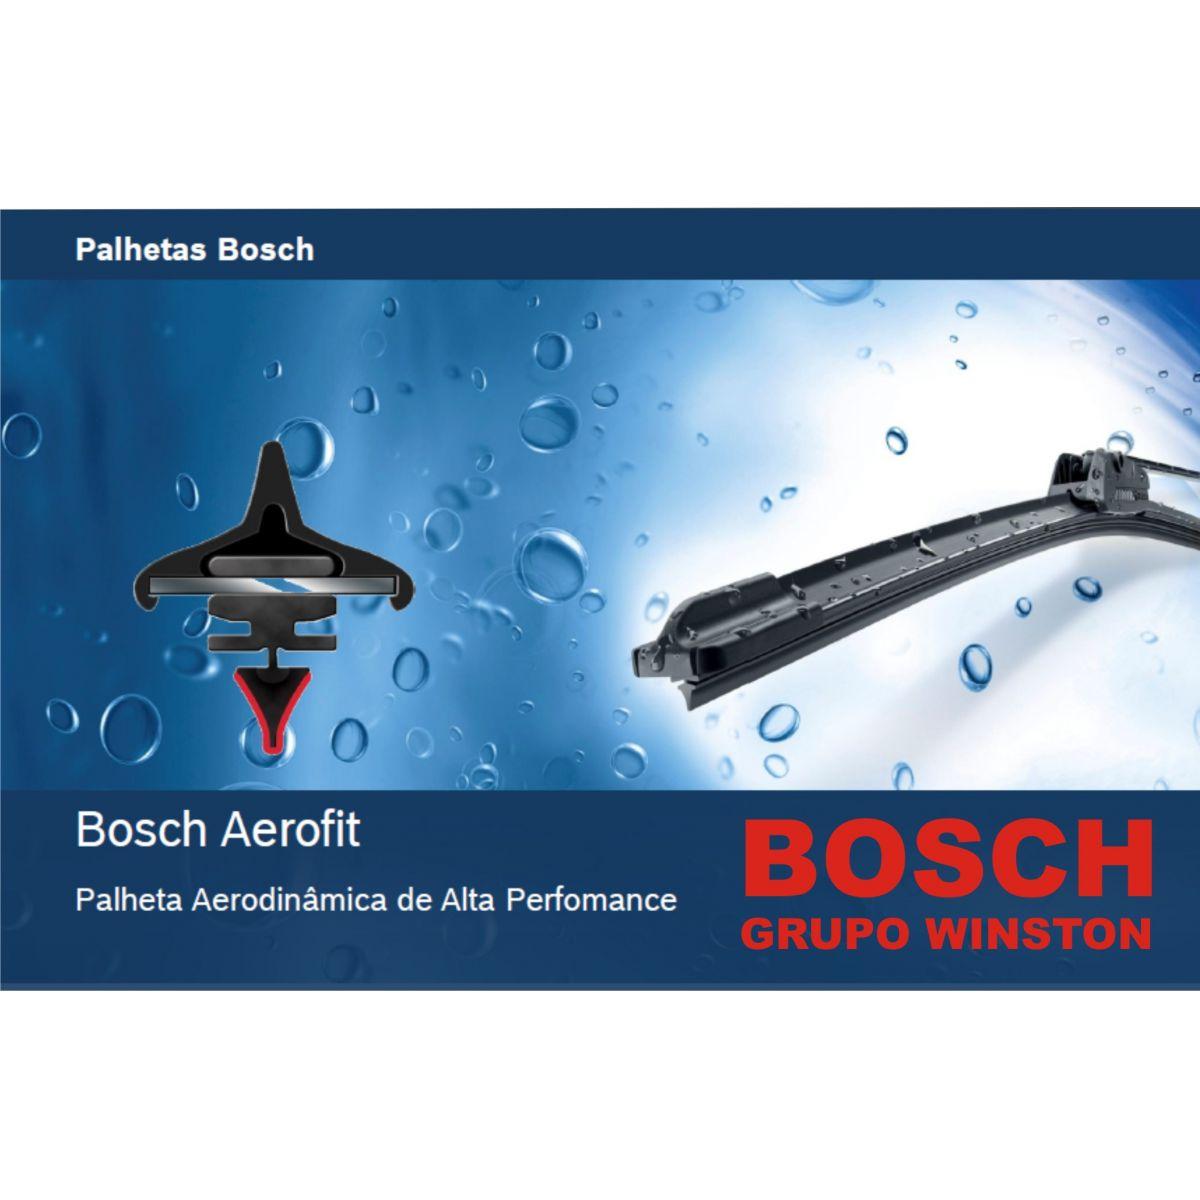 Palheta Bosch Aerofit Limpador de para brisa Bosch KIA Picanto